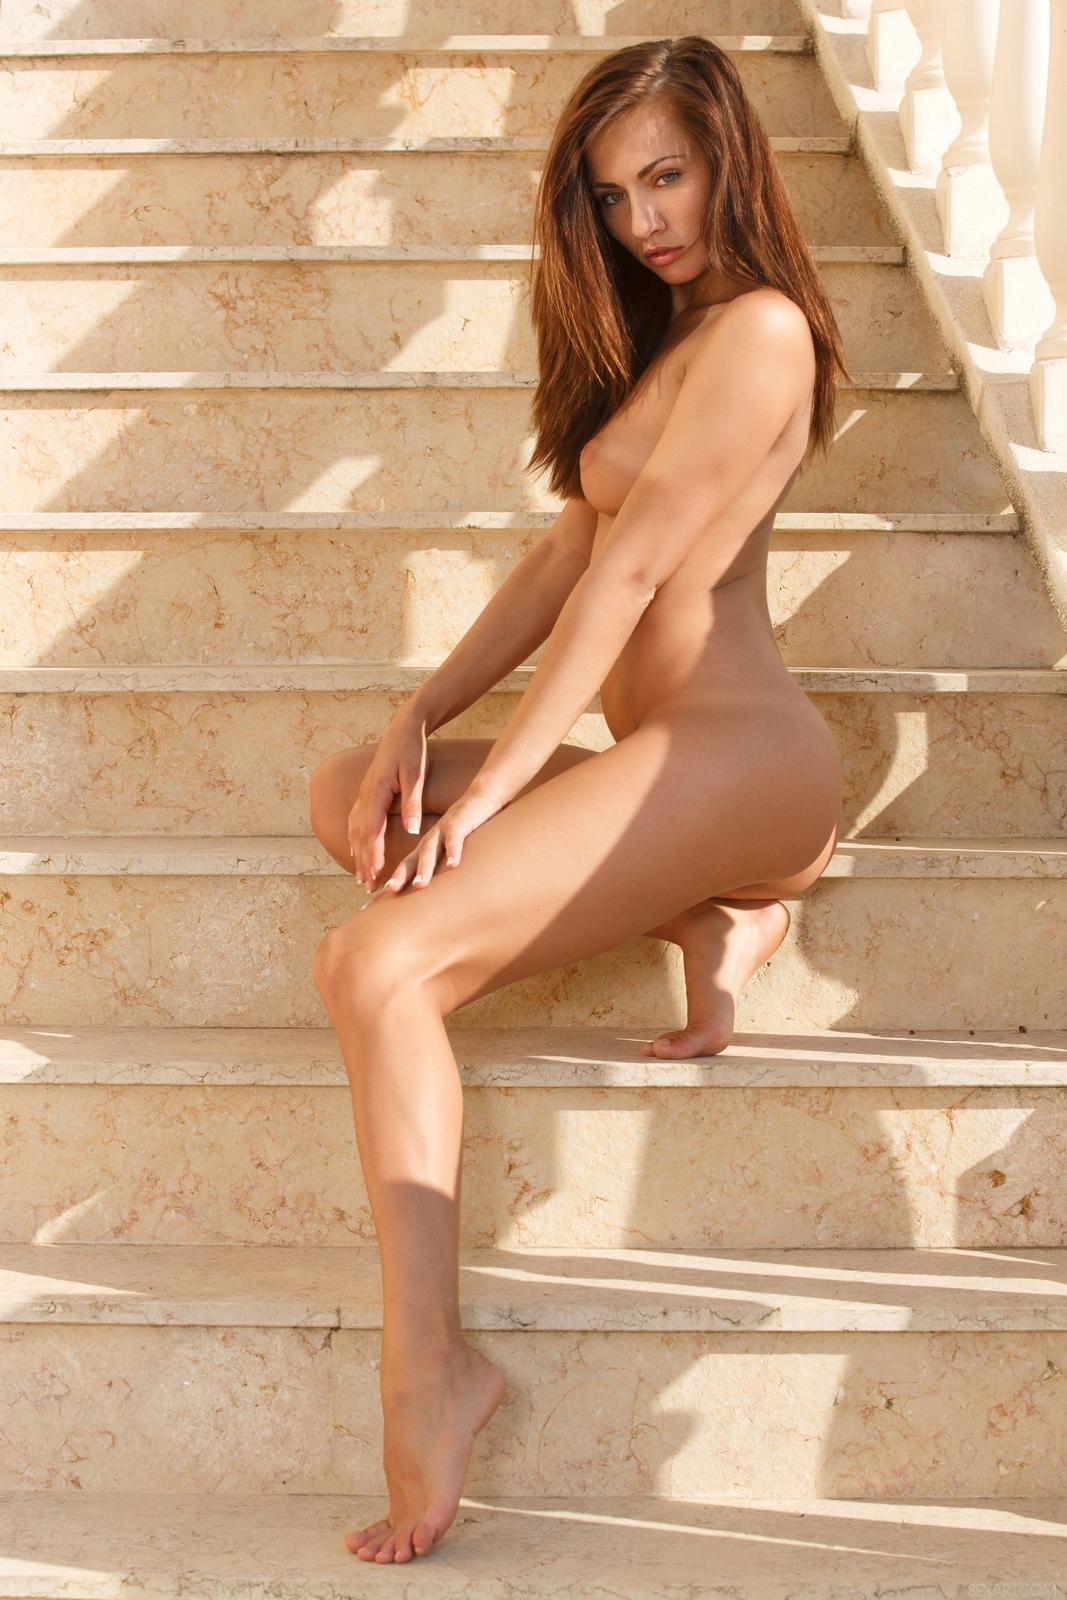 michaela-isizzu-stairs-high-heels-naked-sexart-28